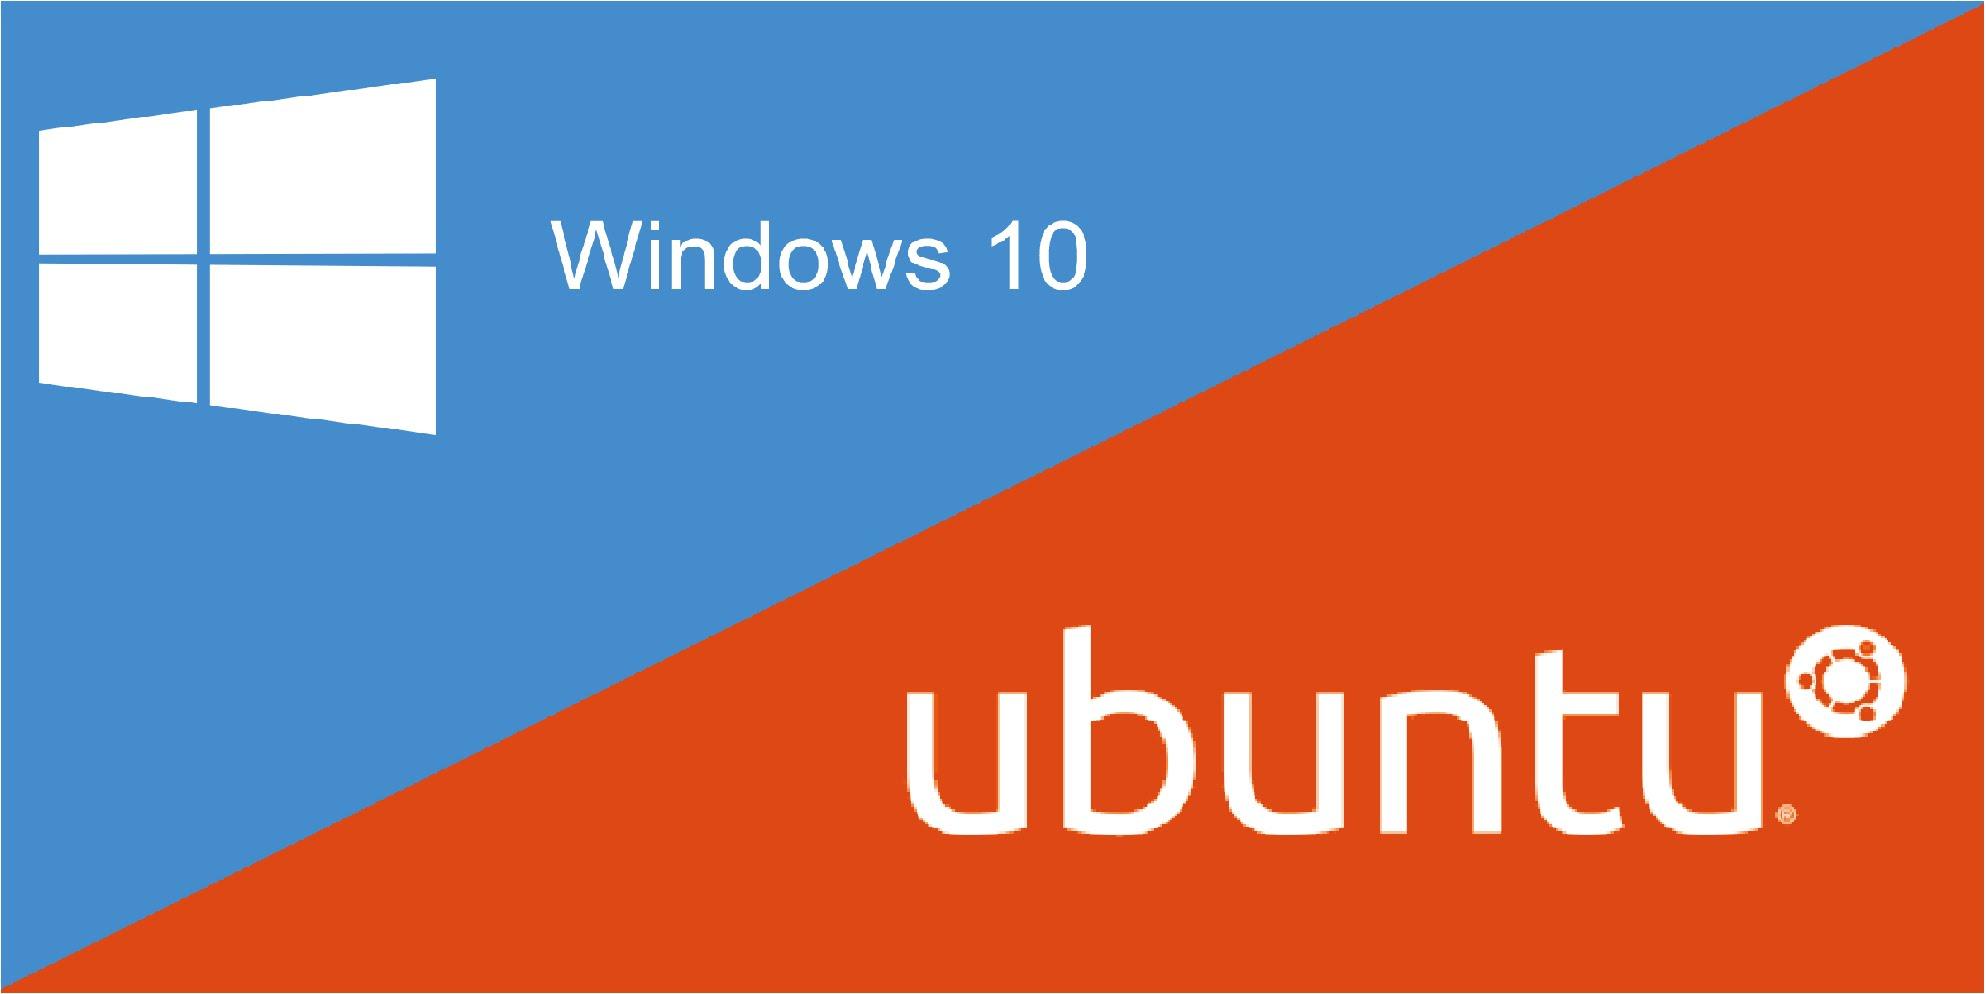 How to Install Ubuntu Desktop on Windows 10